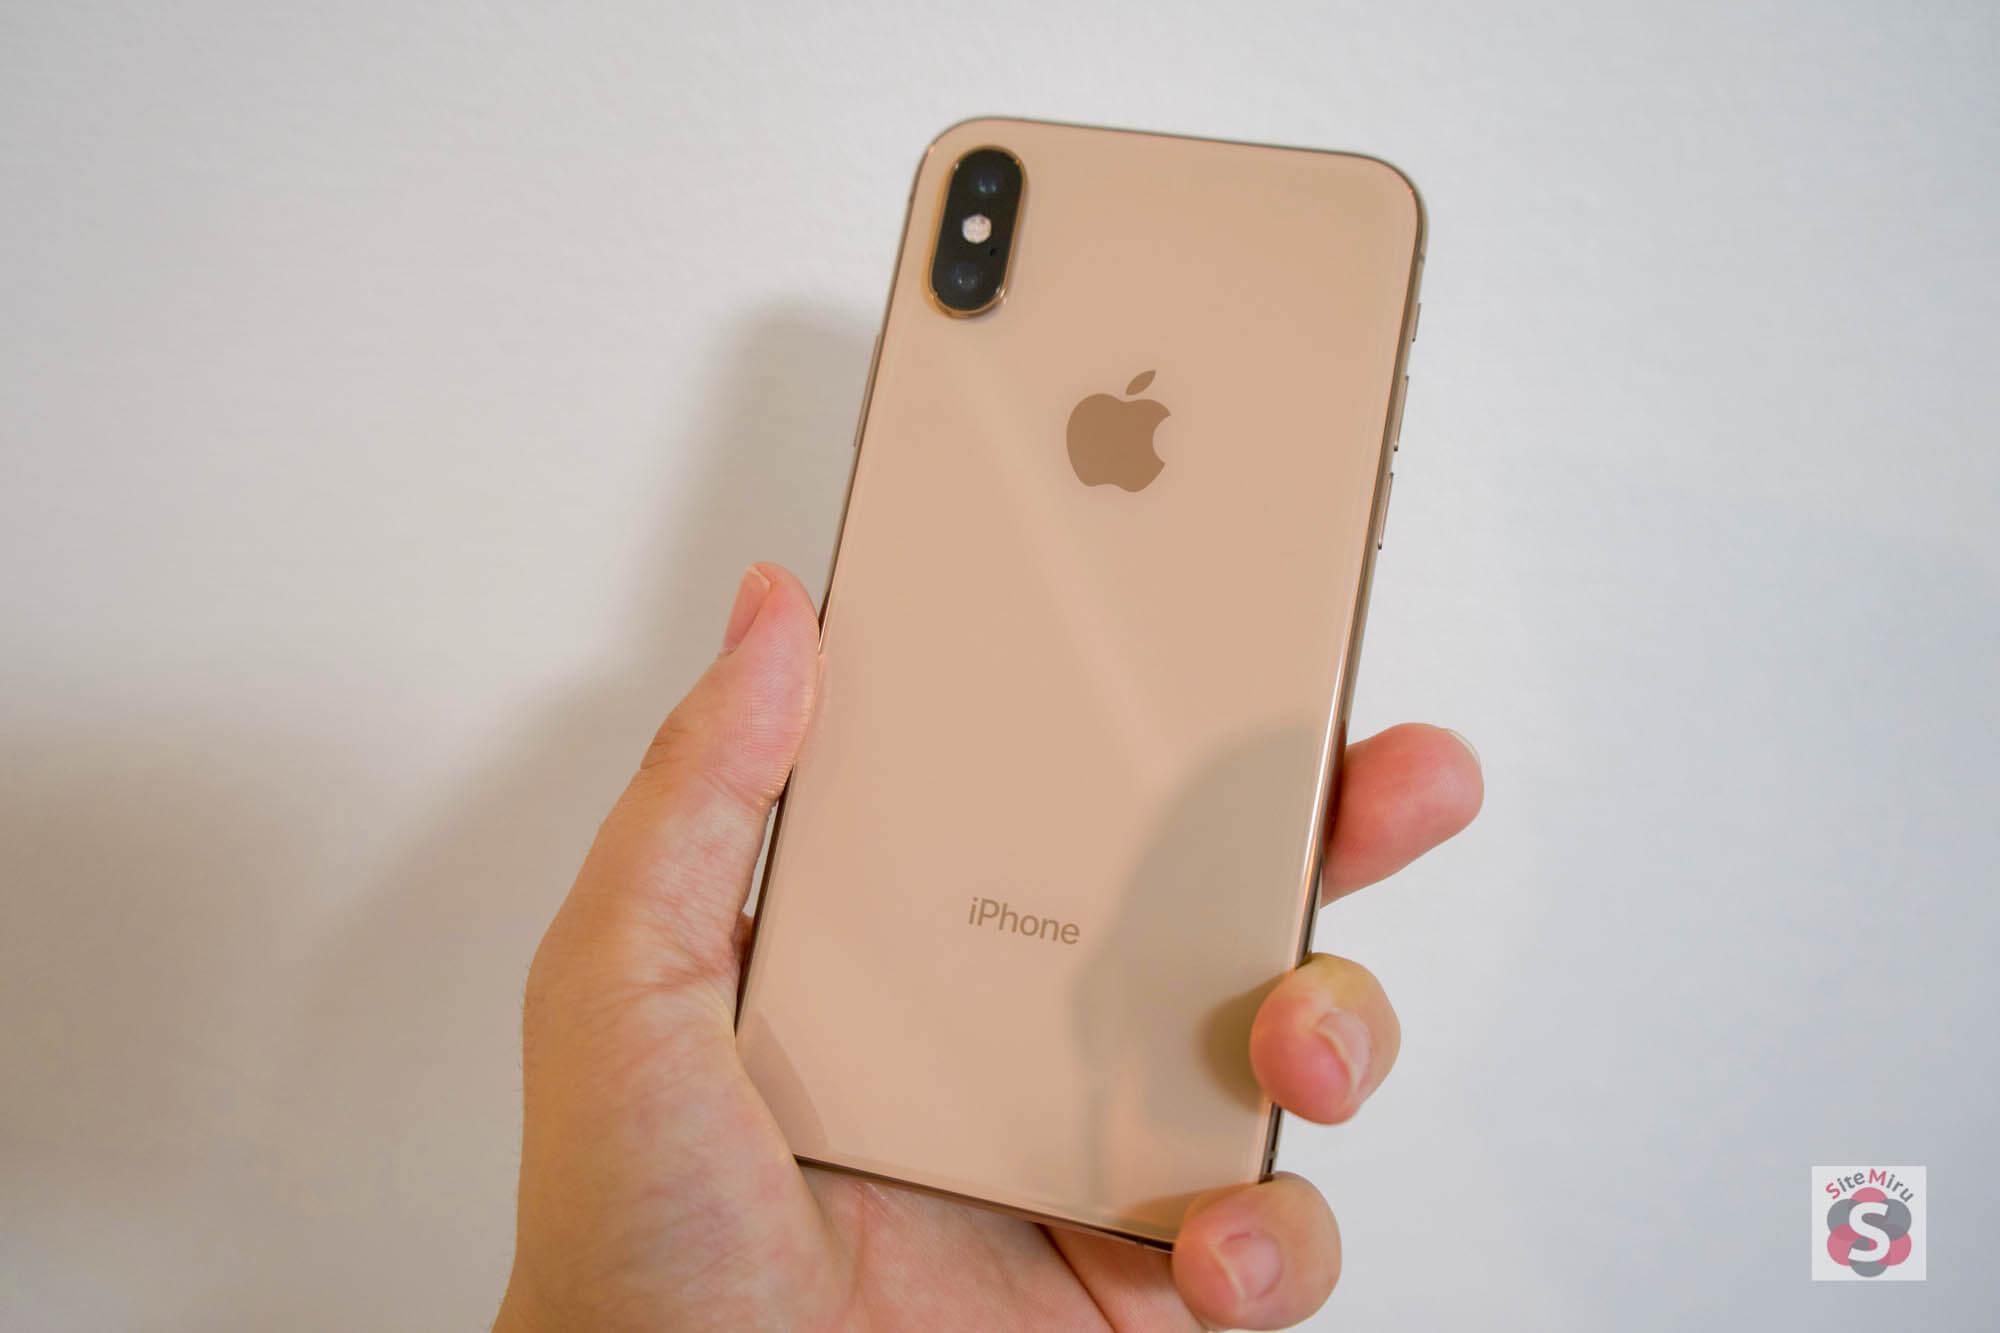 iPhone XS Maxではなく『iPhone XS』を選んだ理由